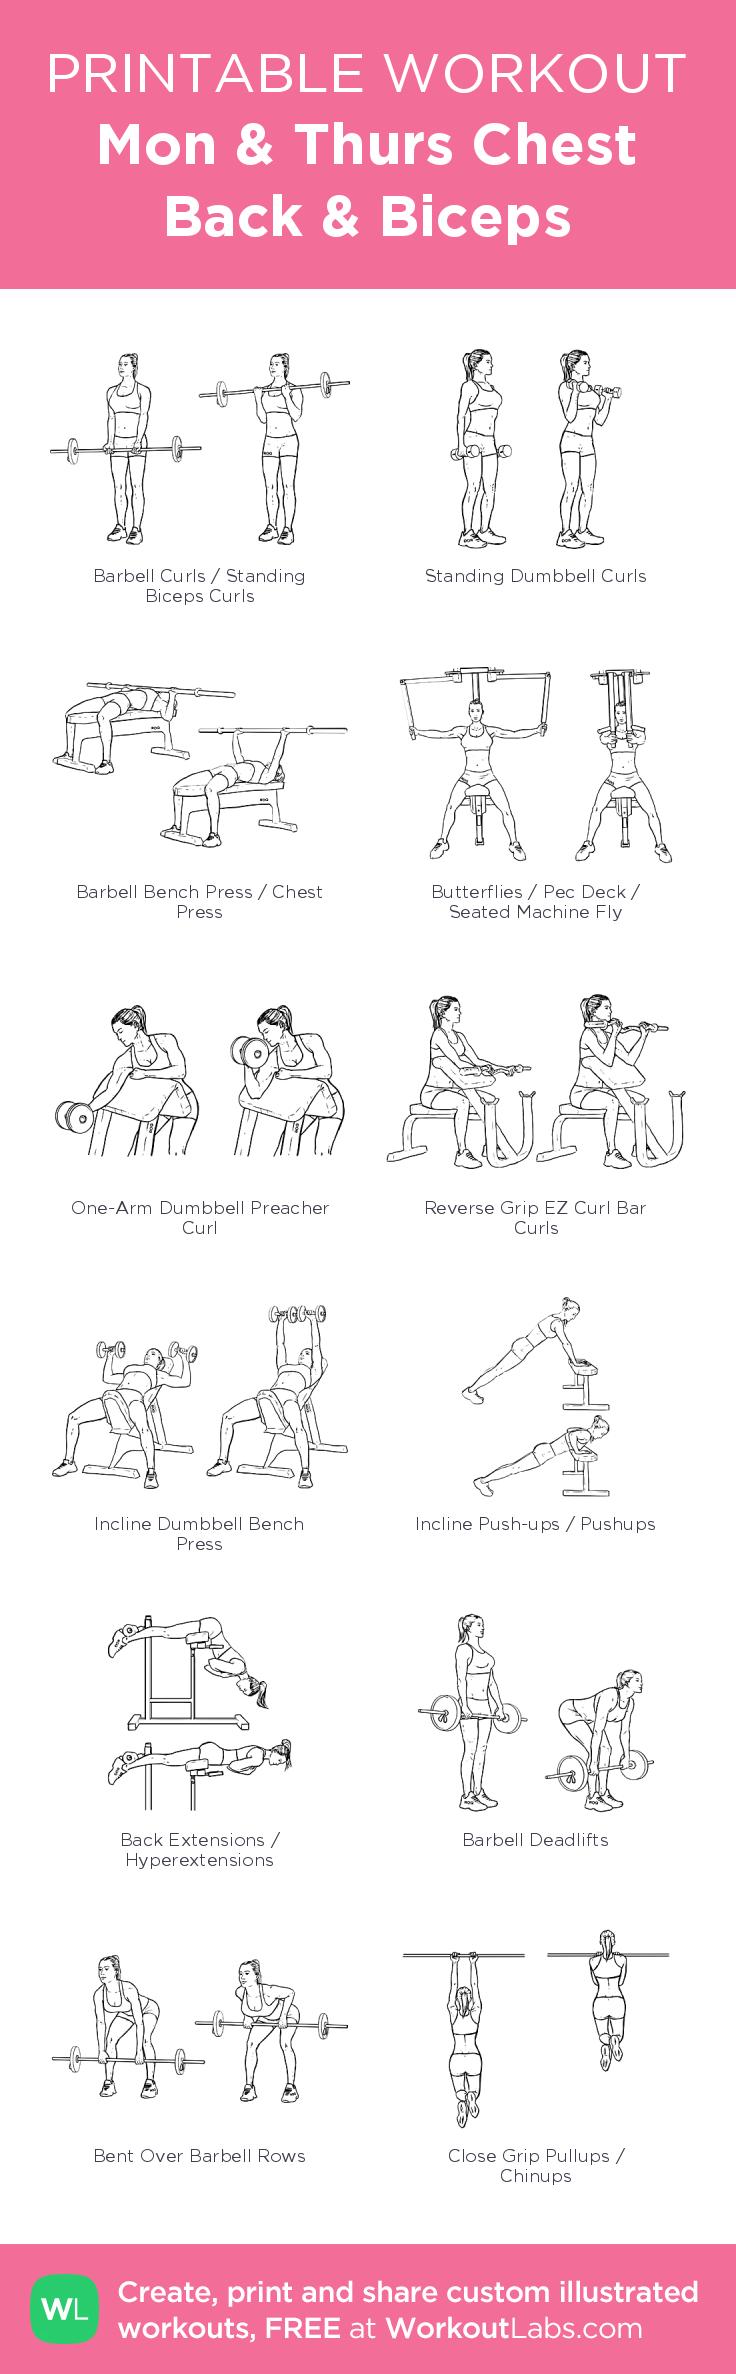 build bigger biceps